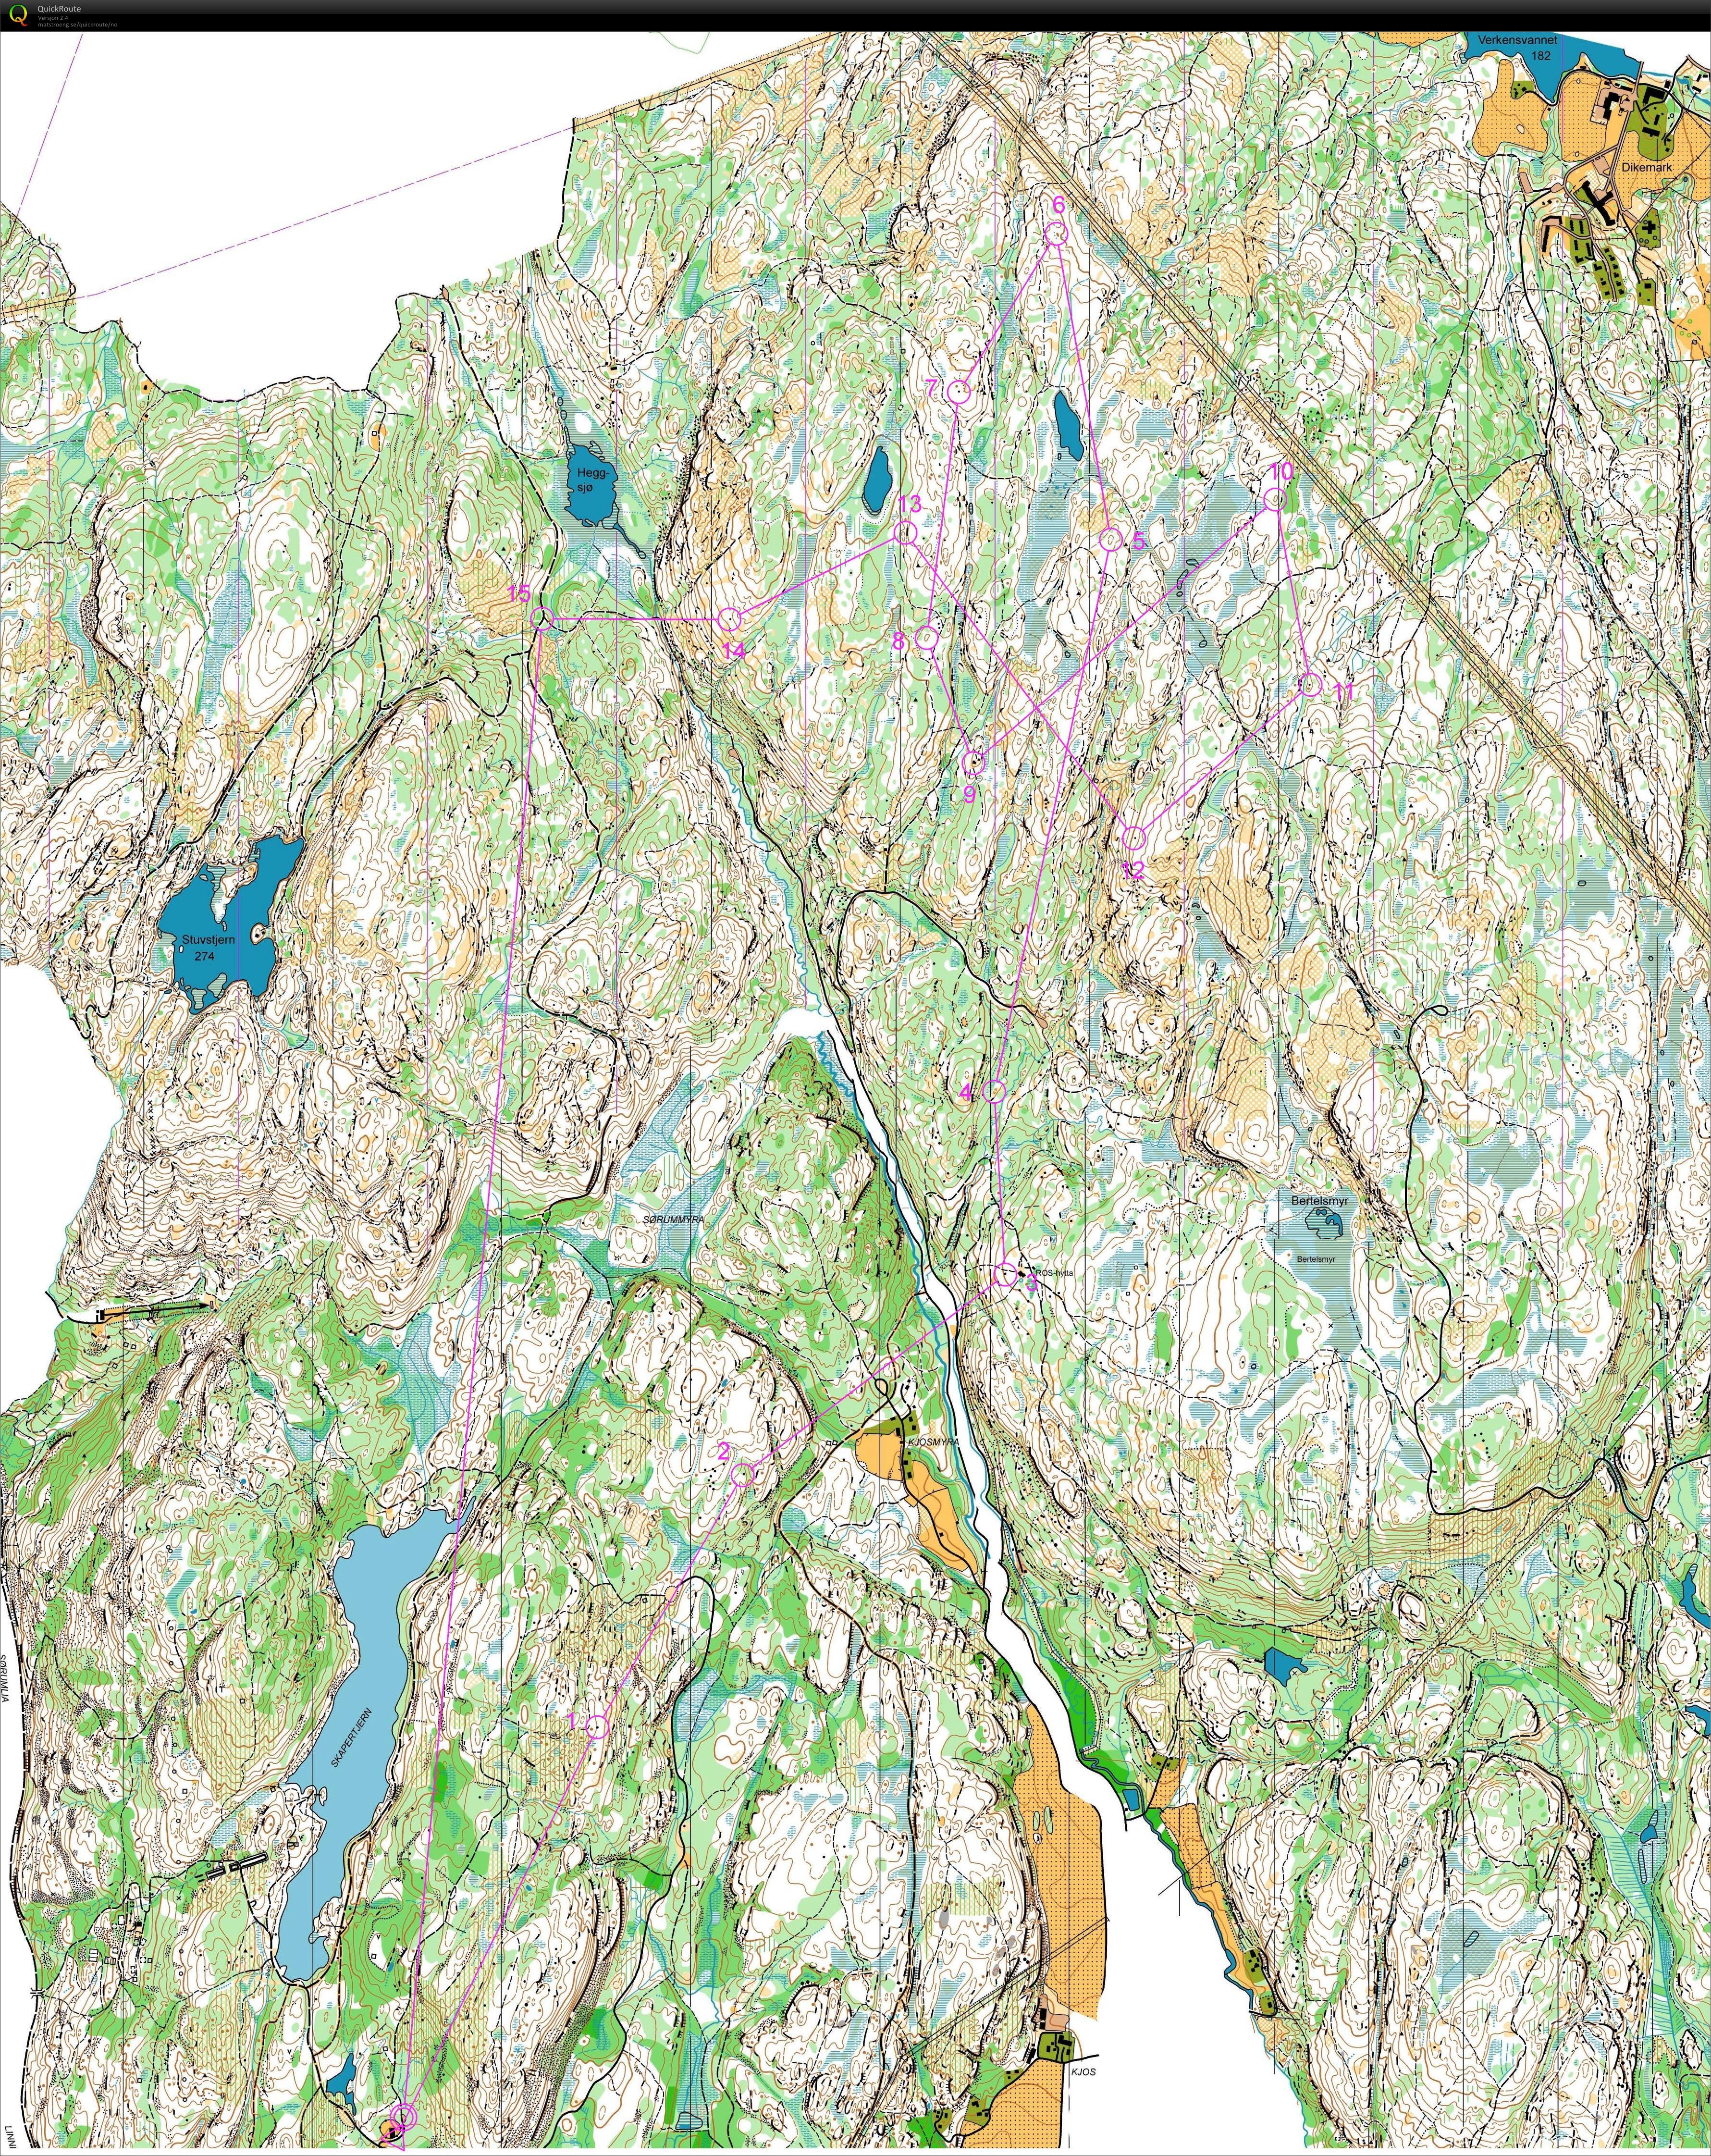 kart kjekstadmarka Mitt digitale veivalgsarkiv :: Søndagskos i Kjekstadmarka (31.05.2015) kart kjekstadmarka